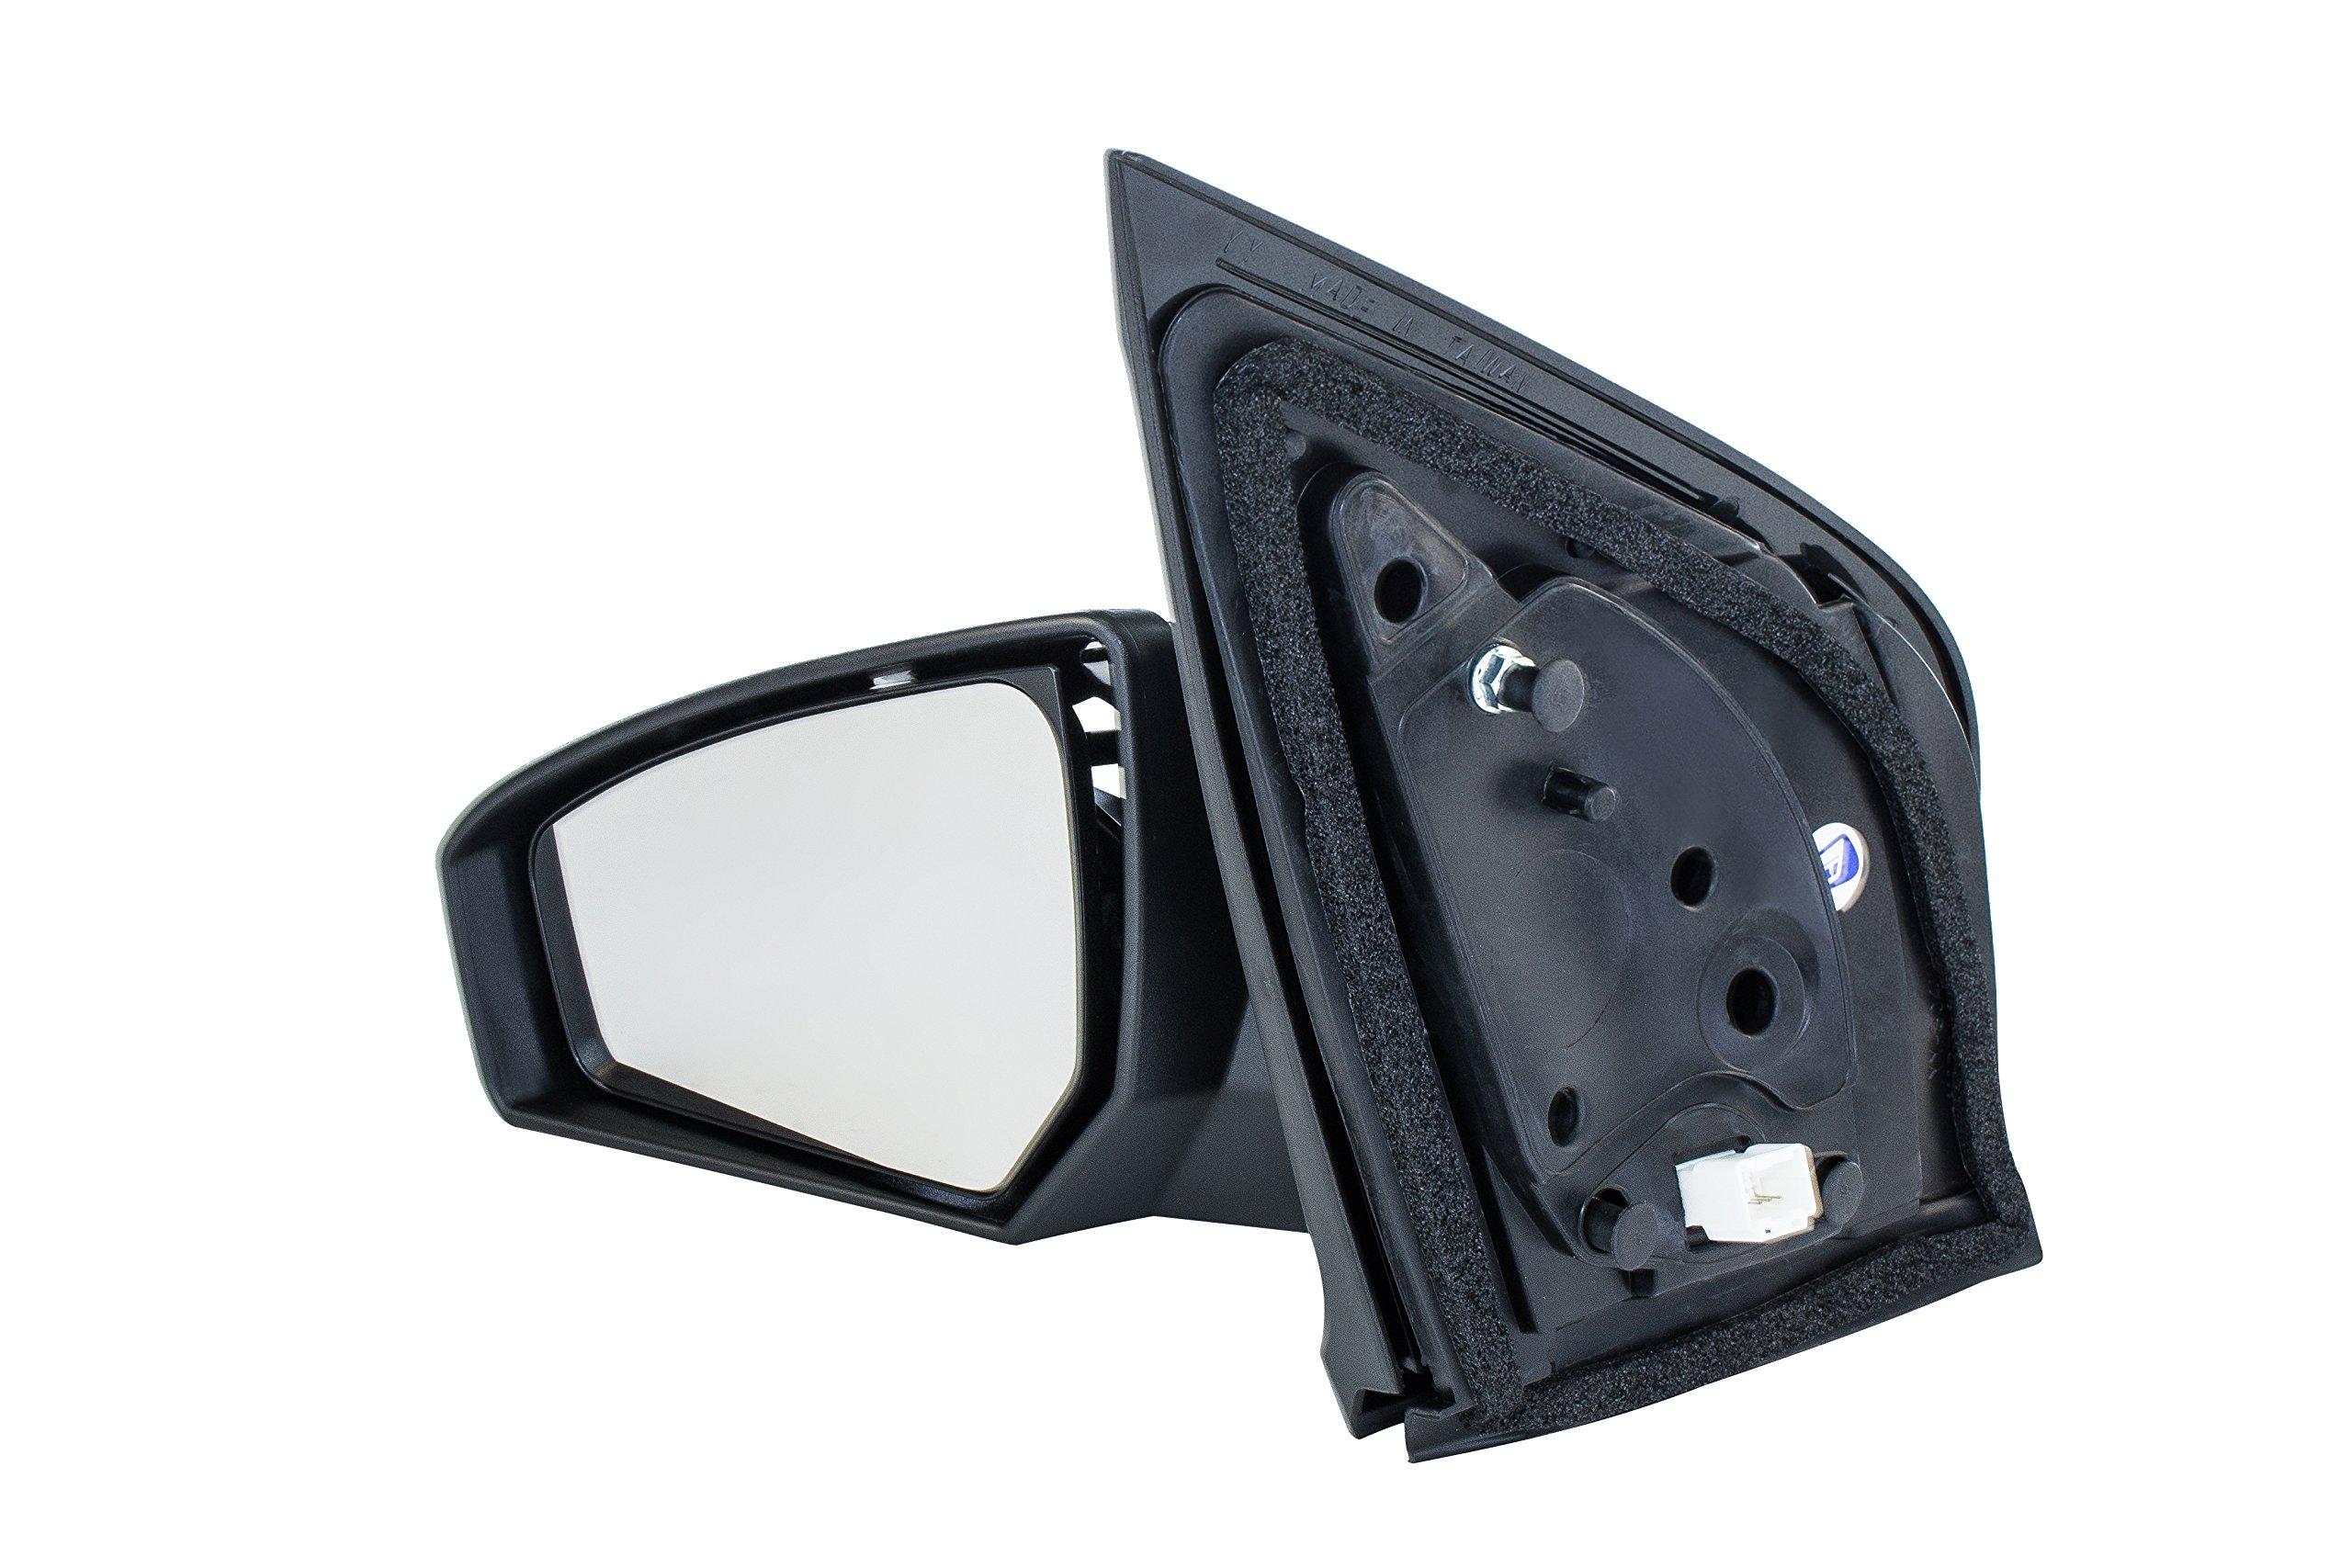 LUJUNTEC Driver Side View Mirror Fits for 2001-2002 Chevy Silverado 1500 HD GMC Sierra 2000-2002 Chevy Suburban Chevy Silverado GMC Yukon 2001-2002 GMC Sierra Manual Folding Heated Black